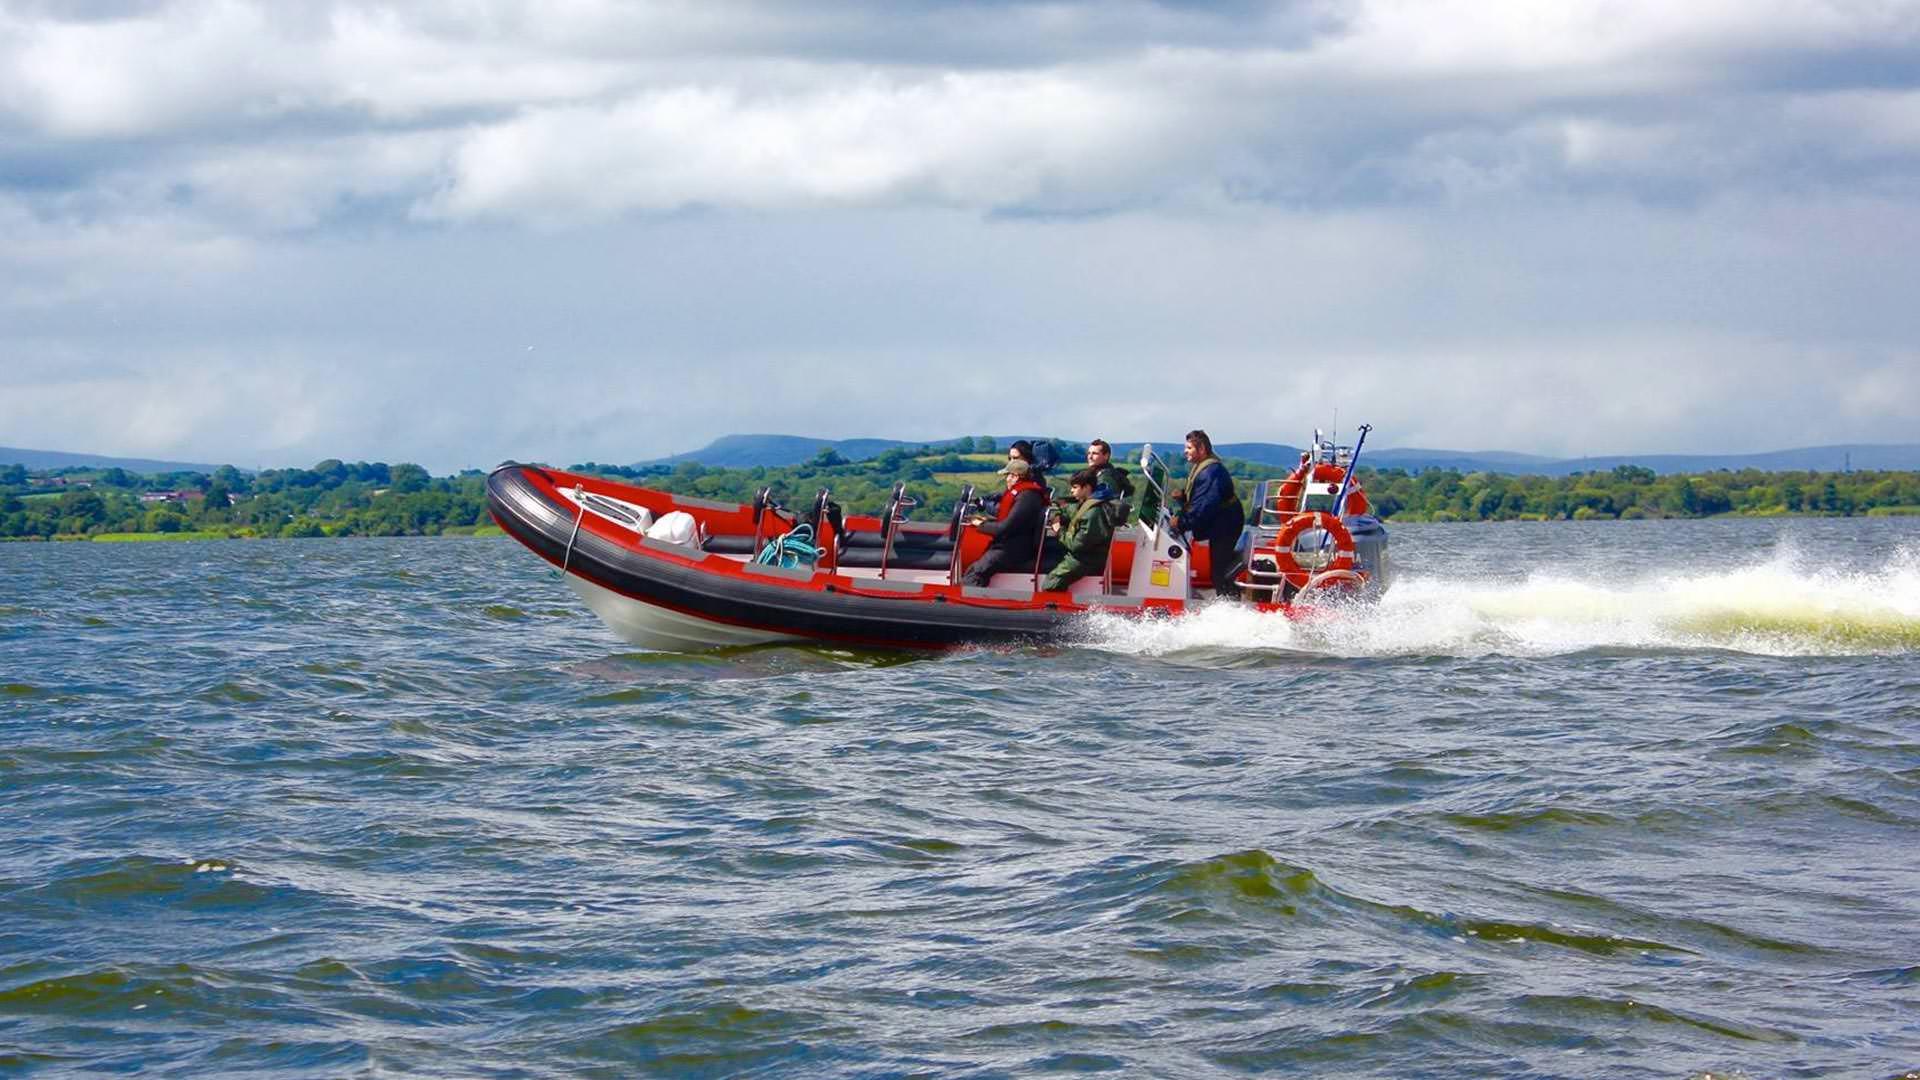 Lough Trips - Abhainn Cruises Northern Ireland